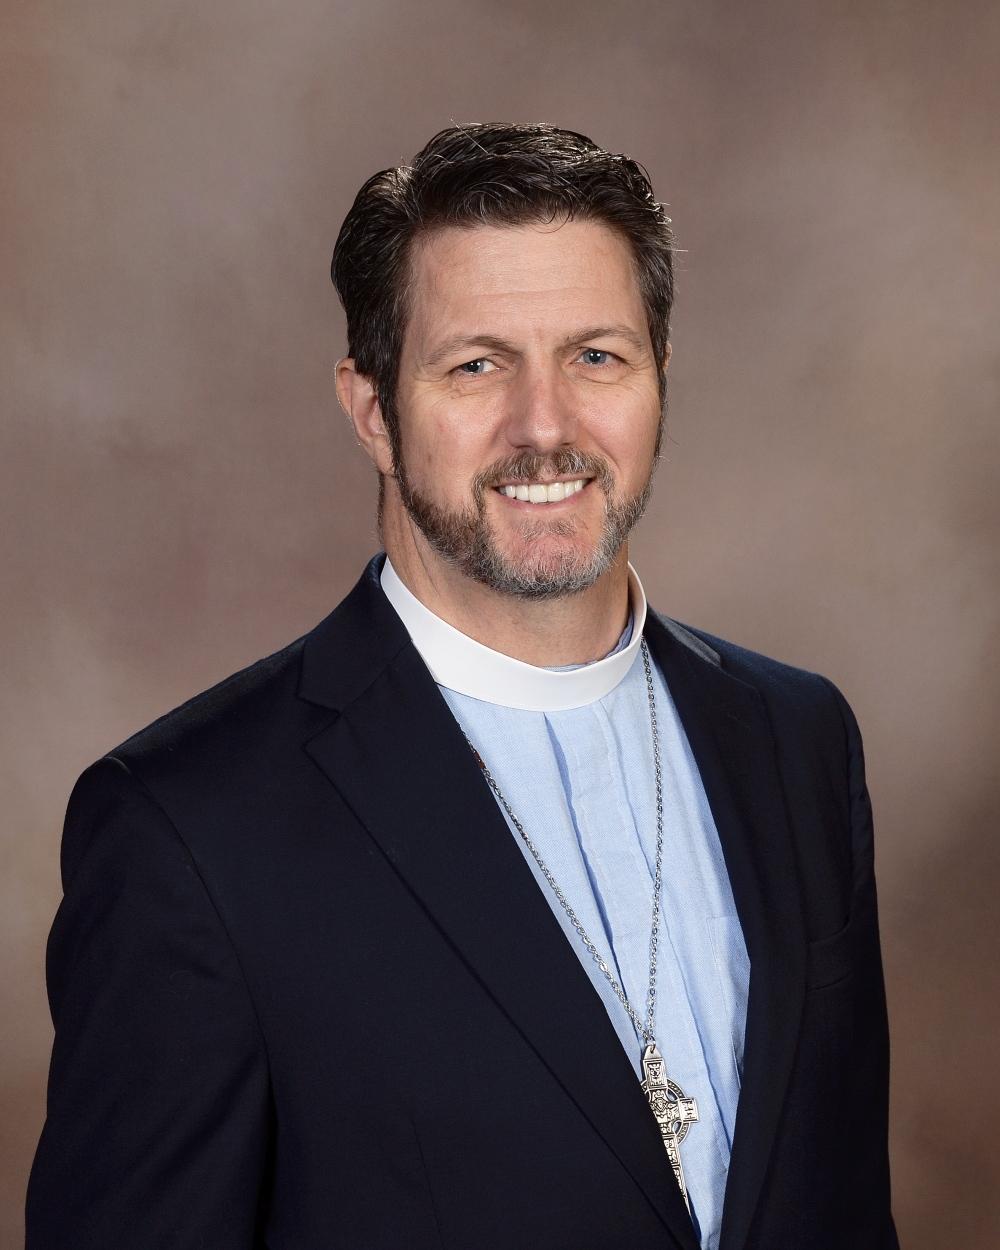 The Rev. Tim Wetherington, Deacon